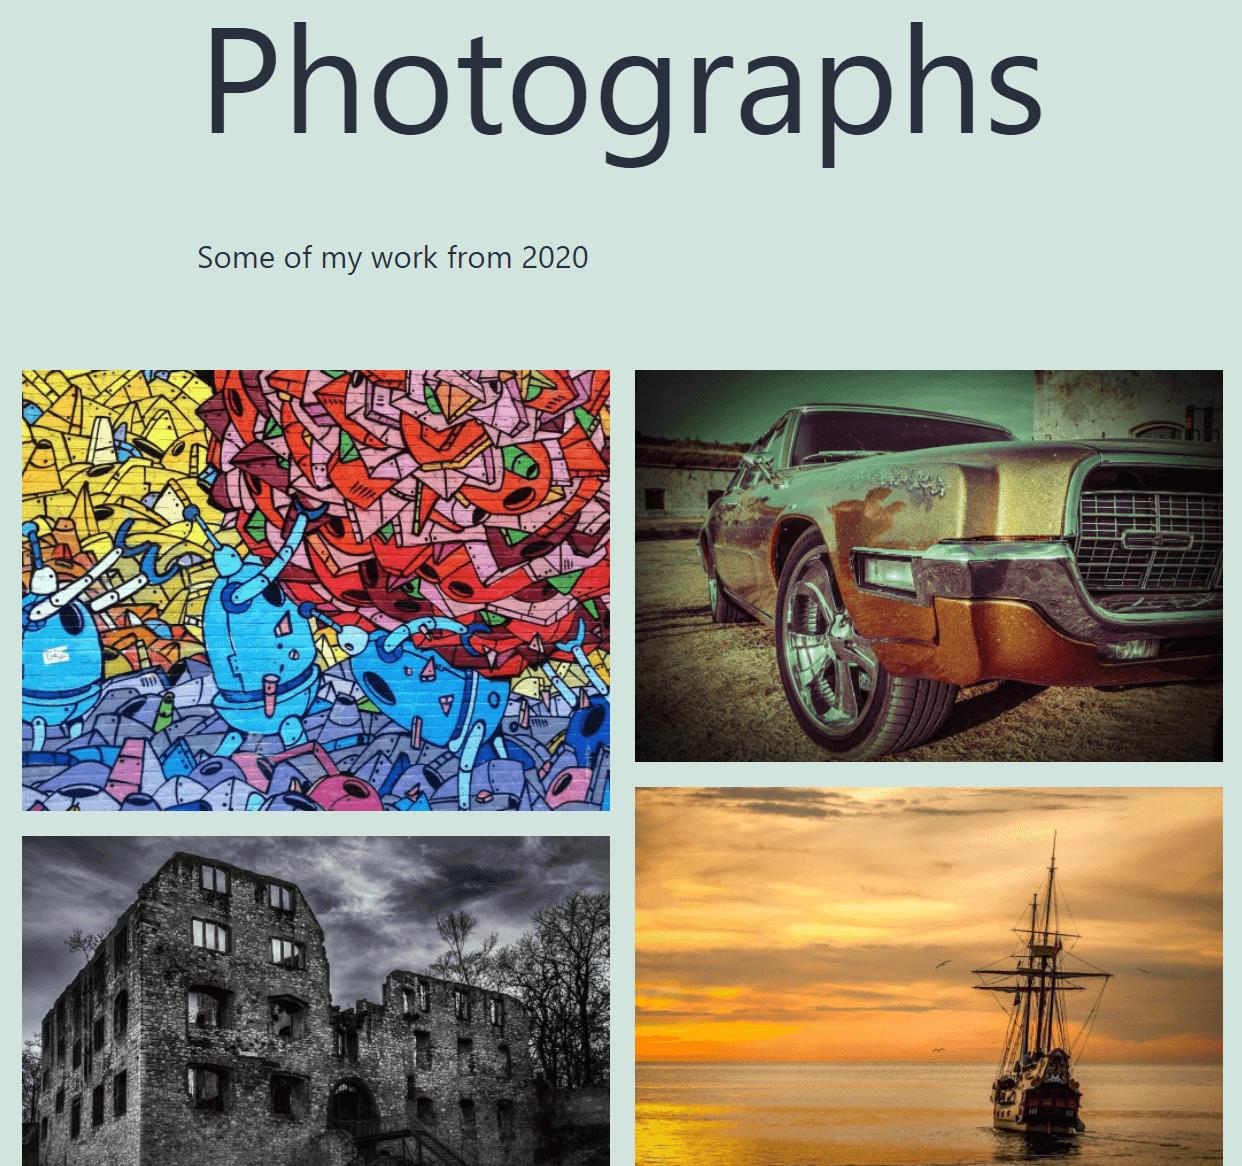 An example of a photography portfolio